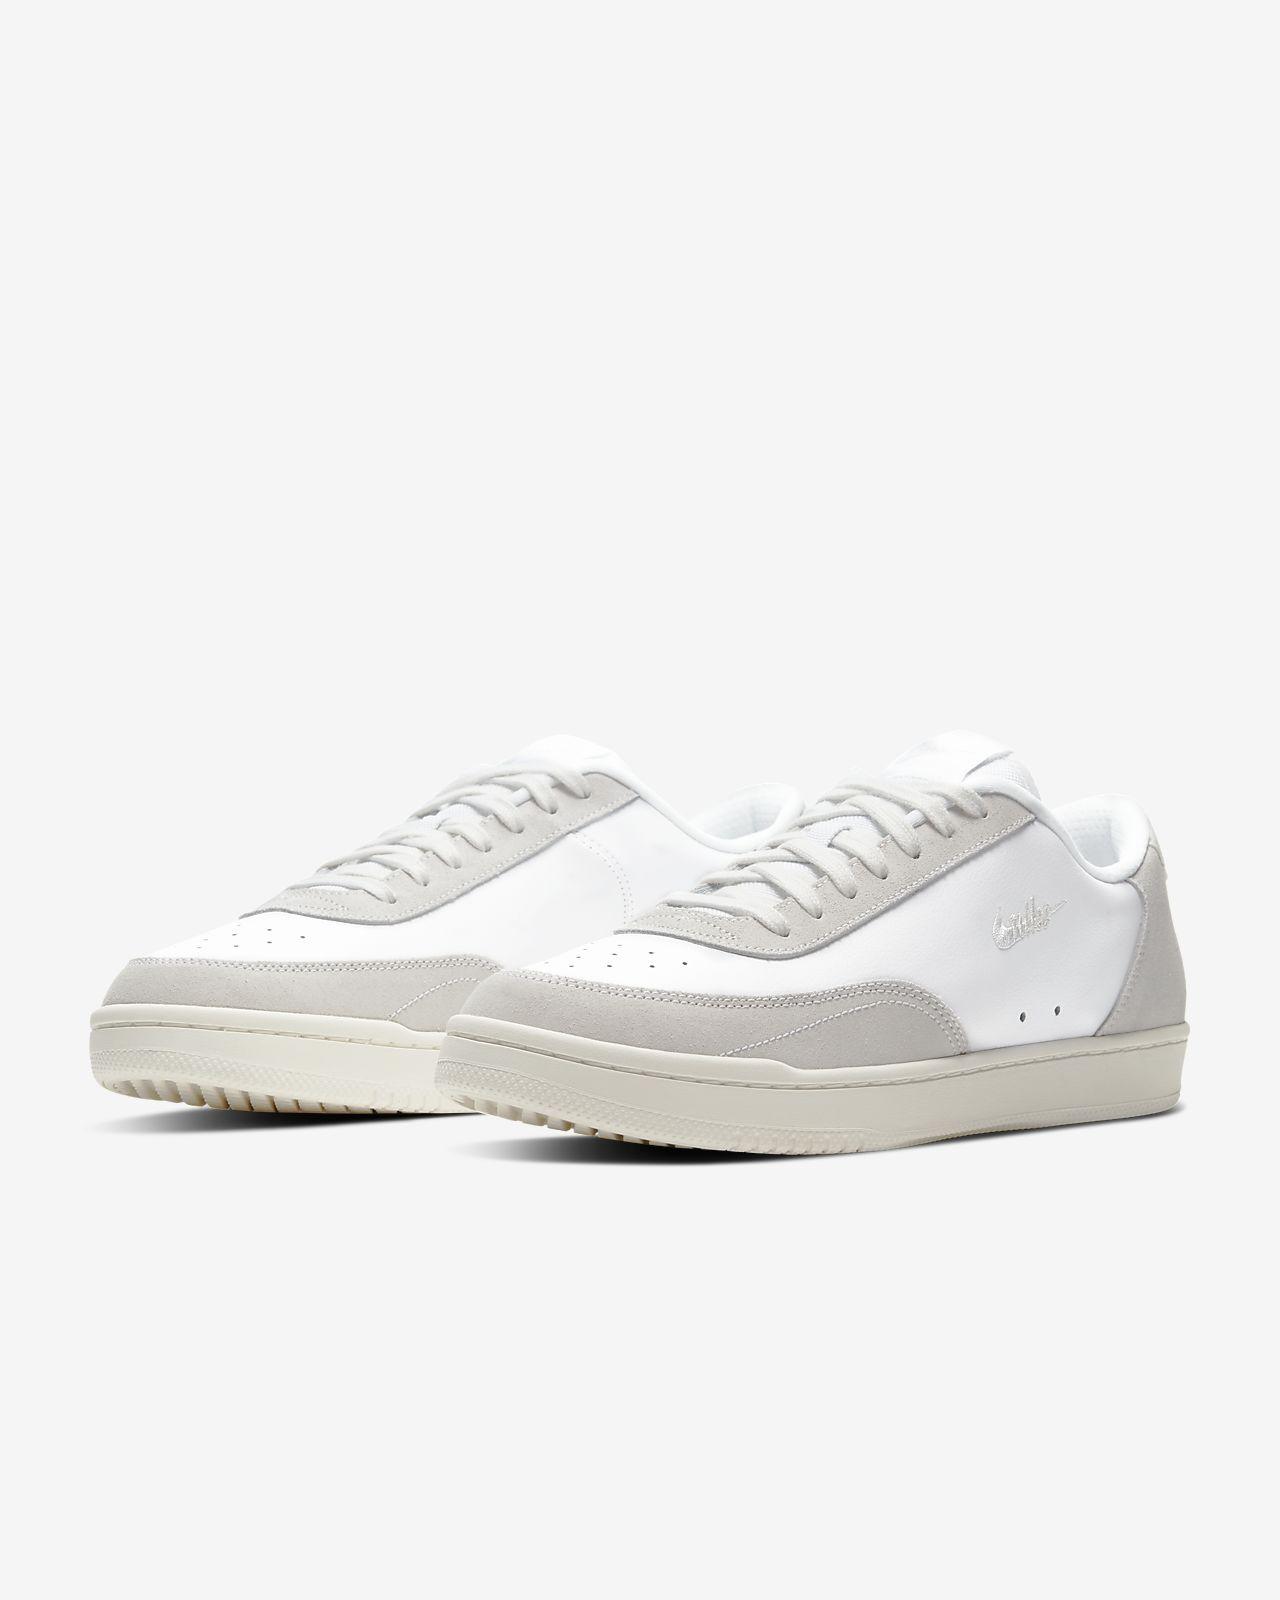 Nouveau Nike LeBron 16 Oreo Chaussures De BasketBall Pas Cher Homme Blanc bleu rouge AO2588_I113 1810121319 Chaussures Basketball Officiel 24 heures